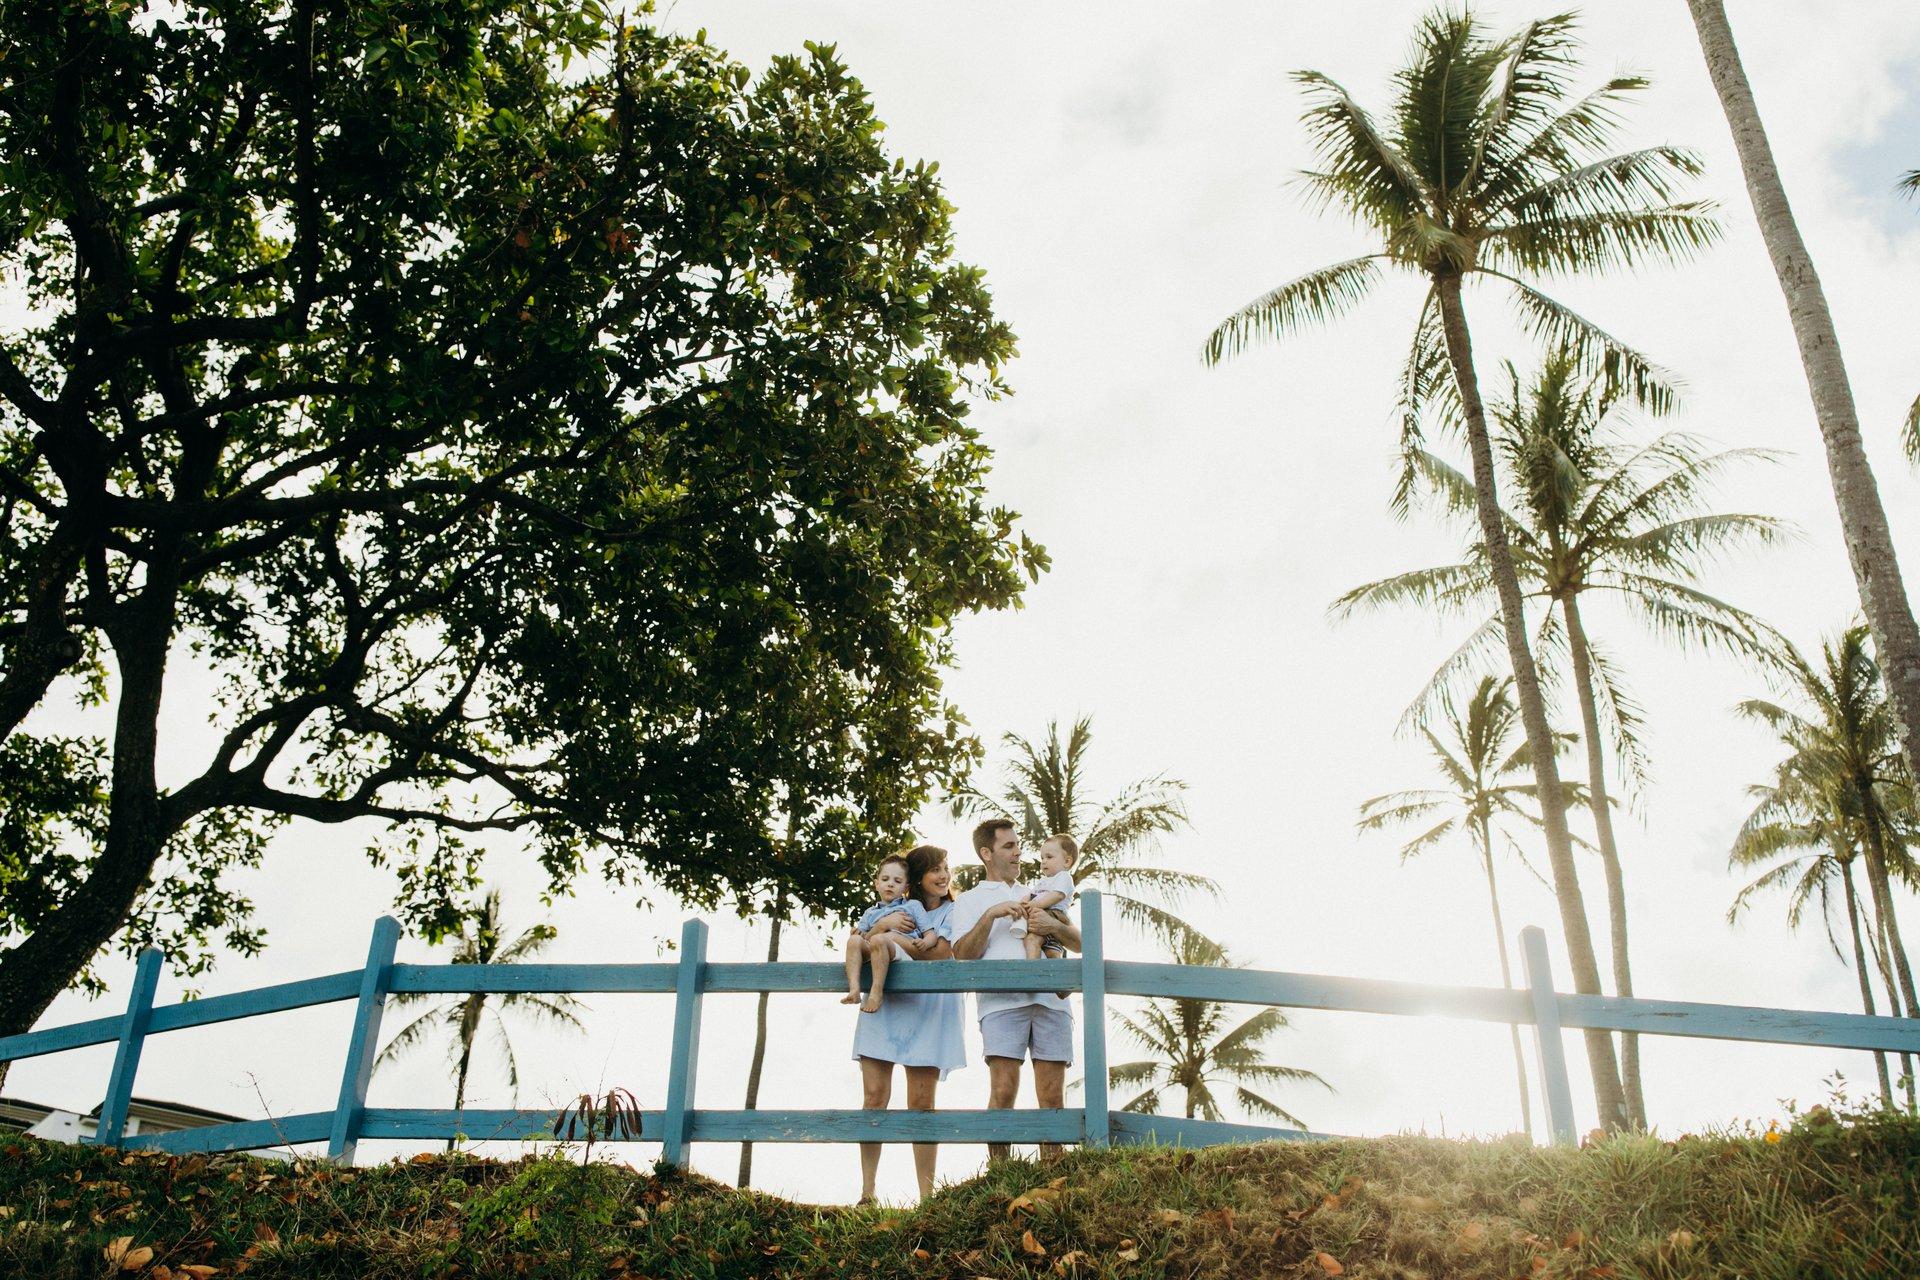 Maui-USA-travel-story-Flytographer-38